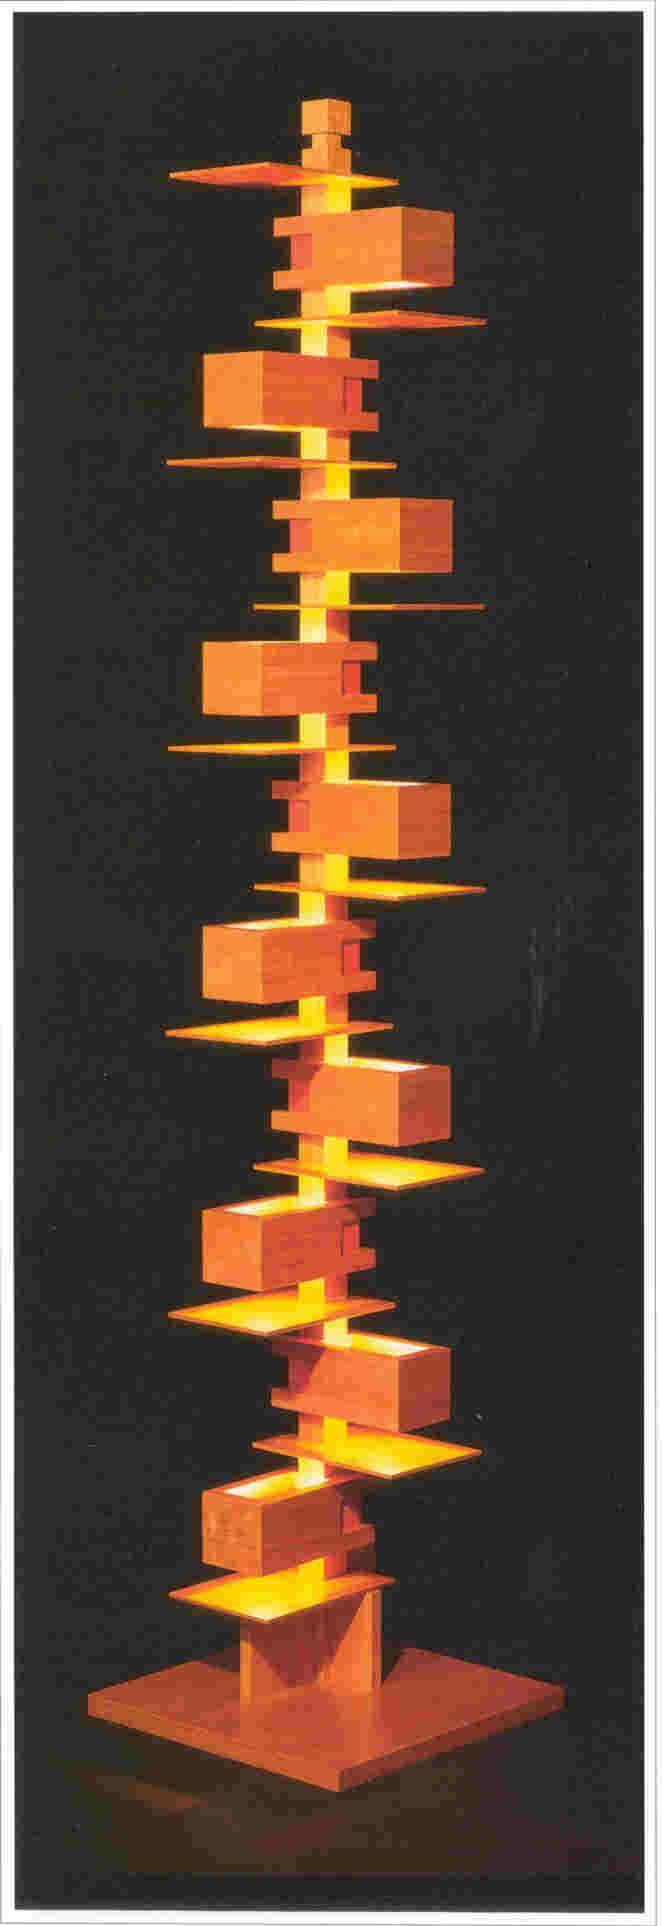 frank lloyd wright lighting lighting pinterest. Black Bedroom Furniture Sets. Home Design Ideas